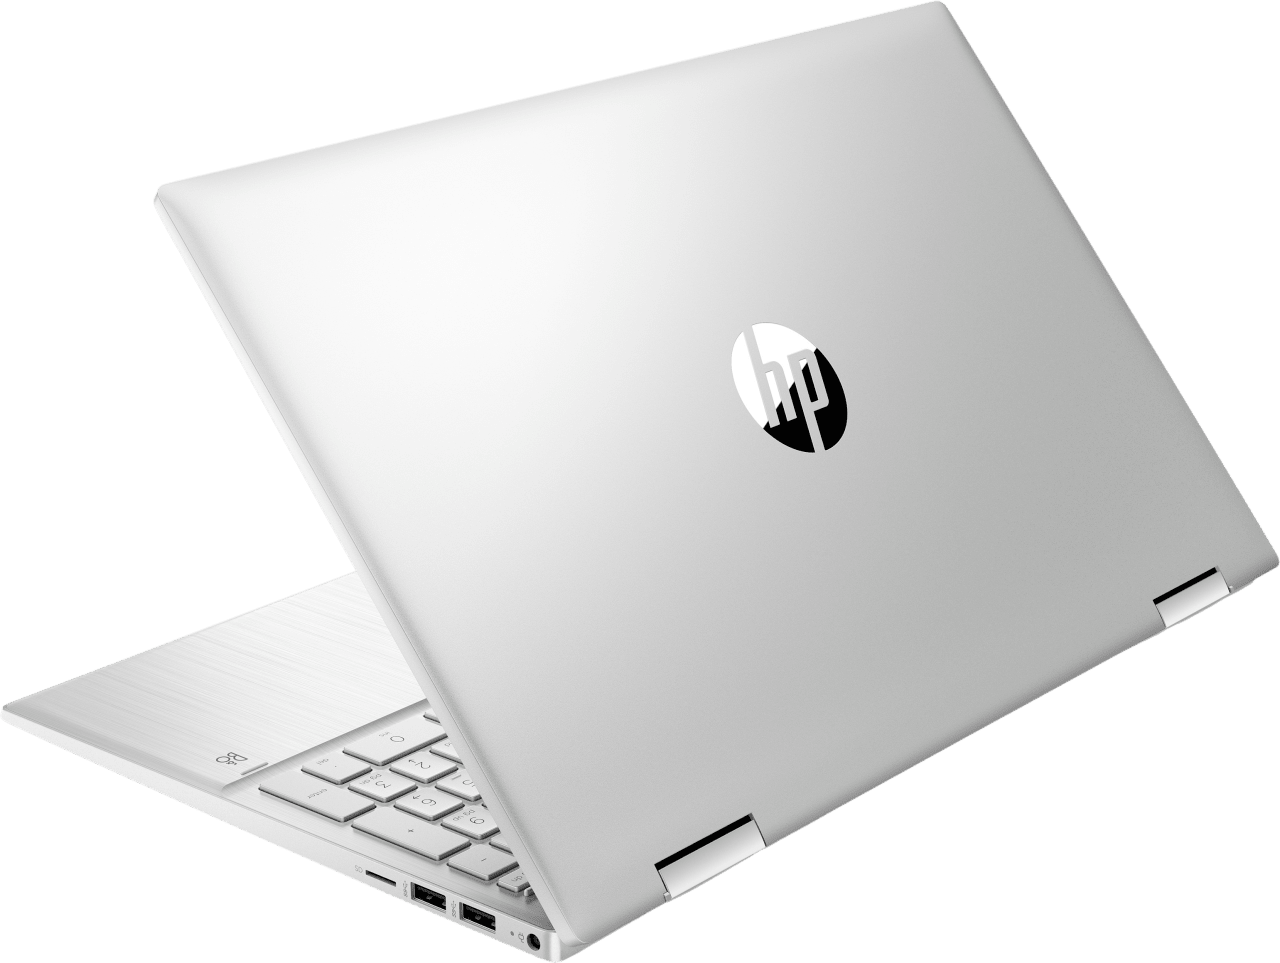 Natural Silver HP Pavilion x360 15-er0055ng Convertible - Intel® Core™ i5-1135G7 - 8GB - 512GB PCIe - Intel® Iris® Xe Graphics.5